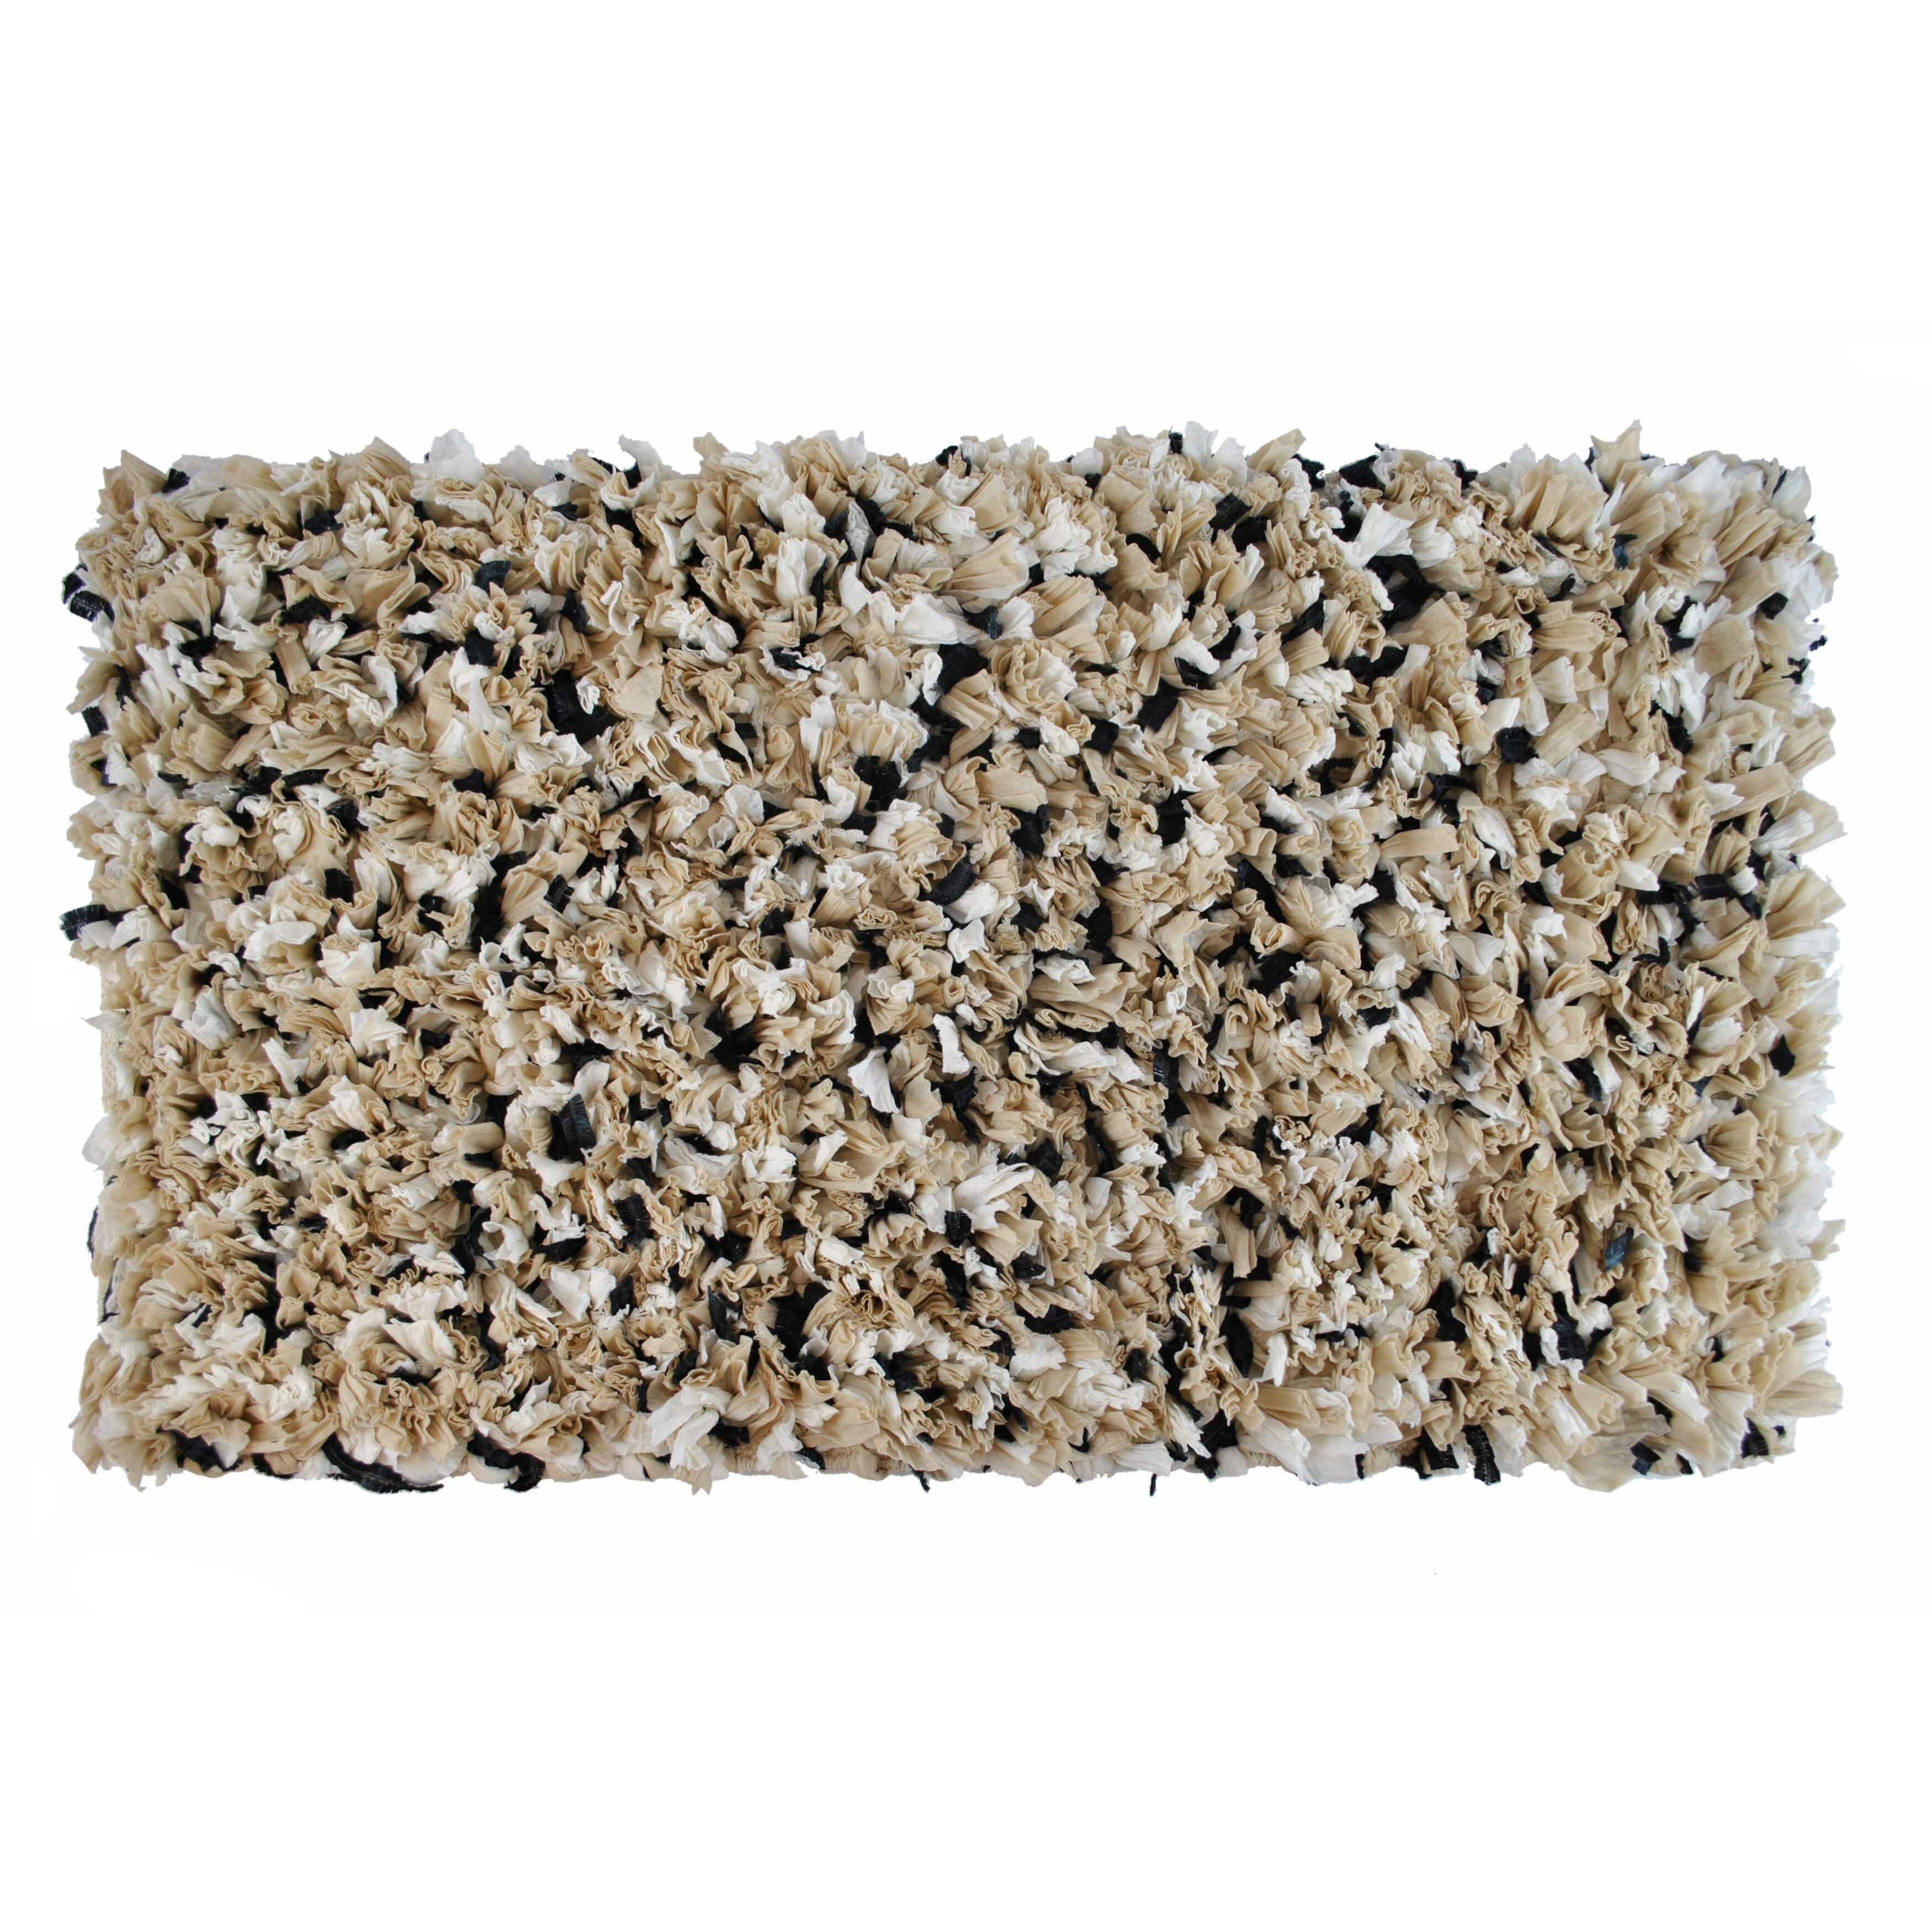 Lavender shower curtain and bath rug set - Lavender Shower Curtain And Bath Rug Set 31